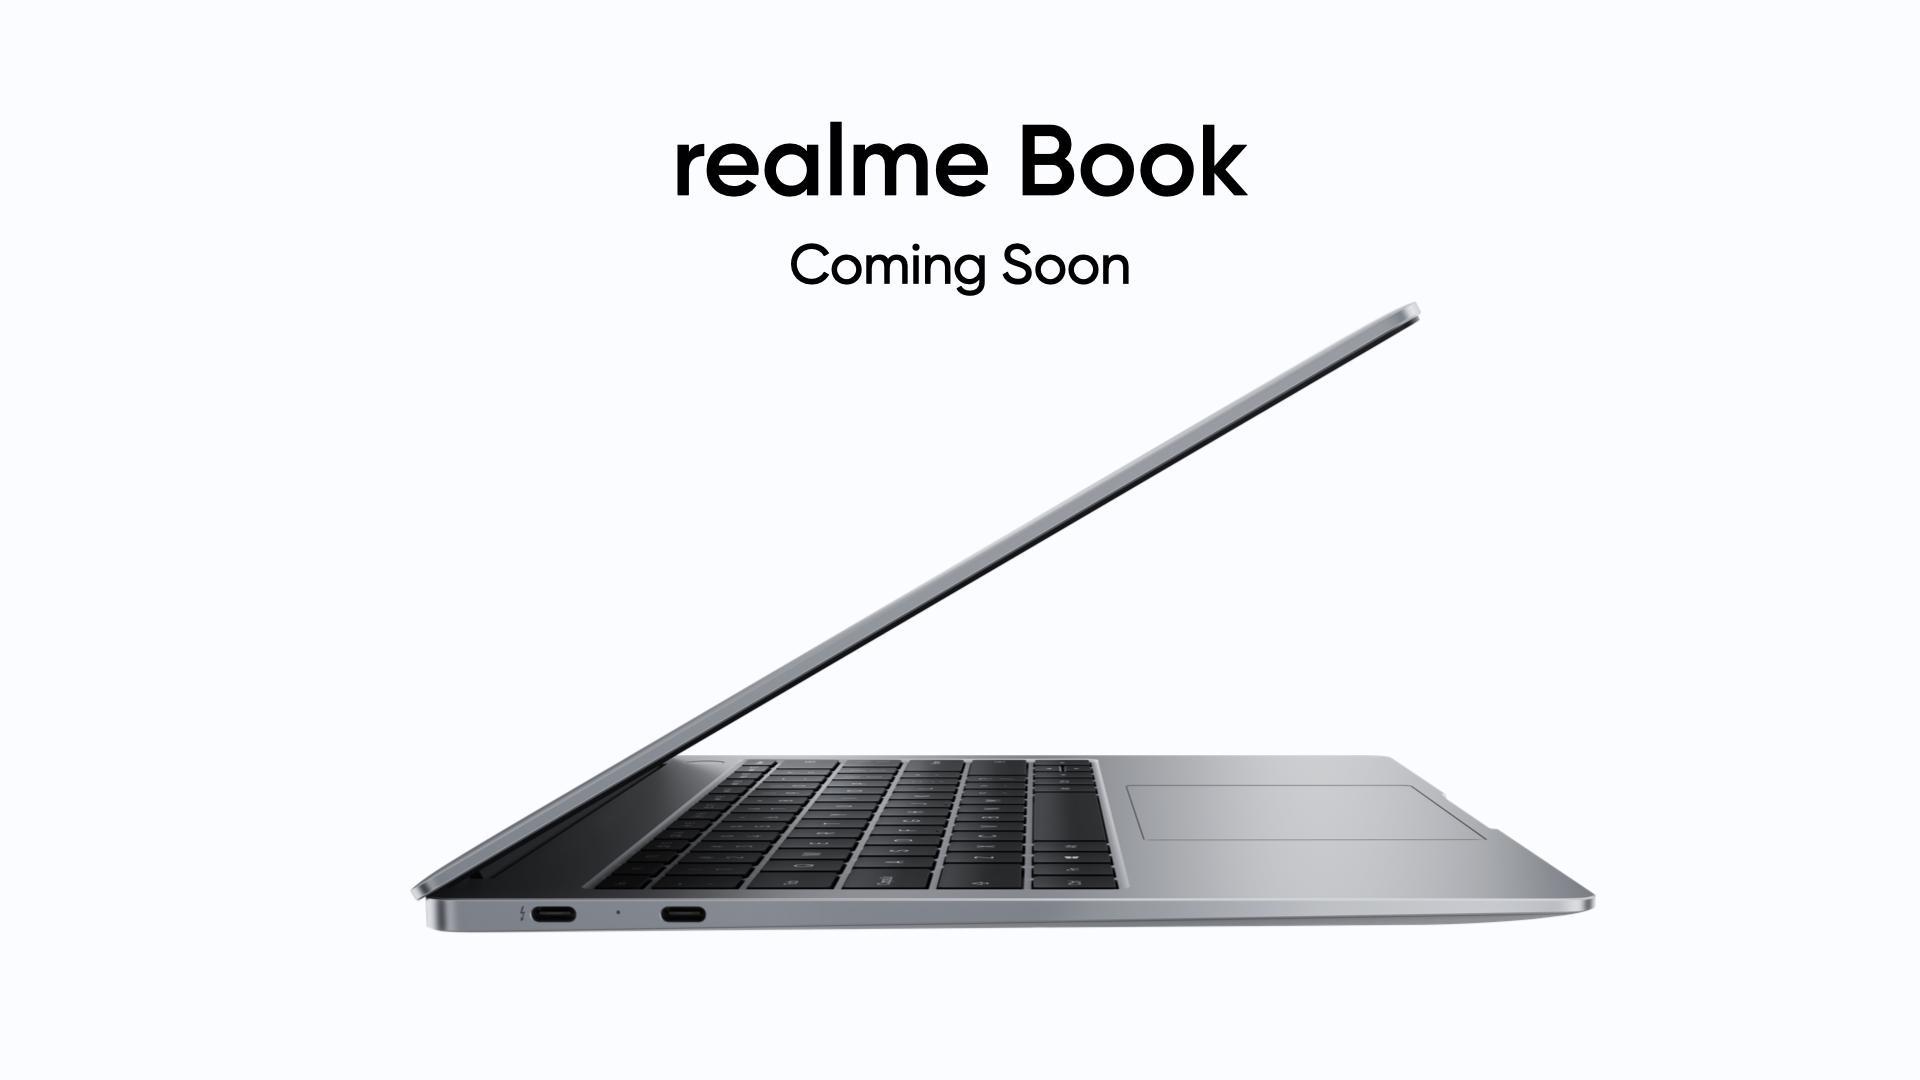 Realme Book - Coming Soon